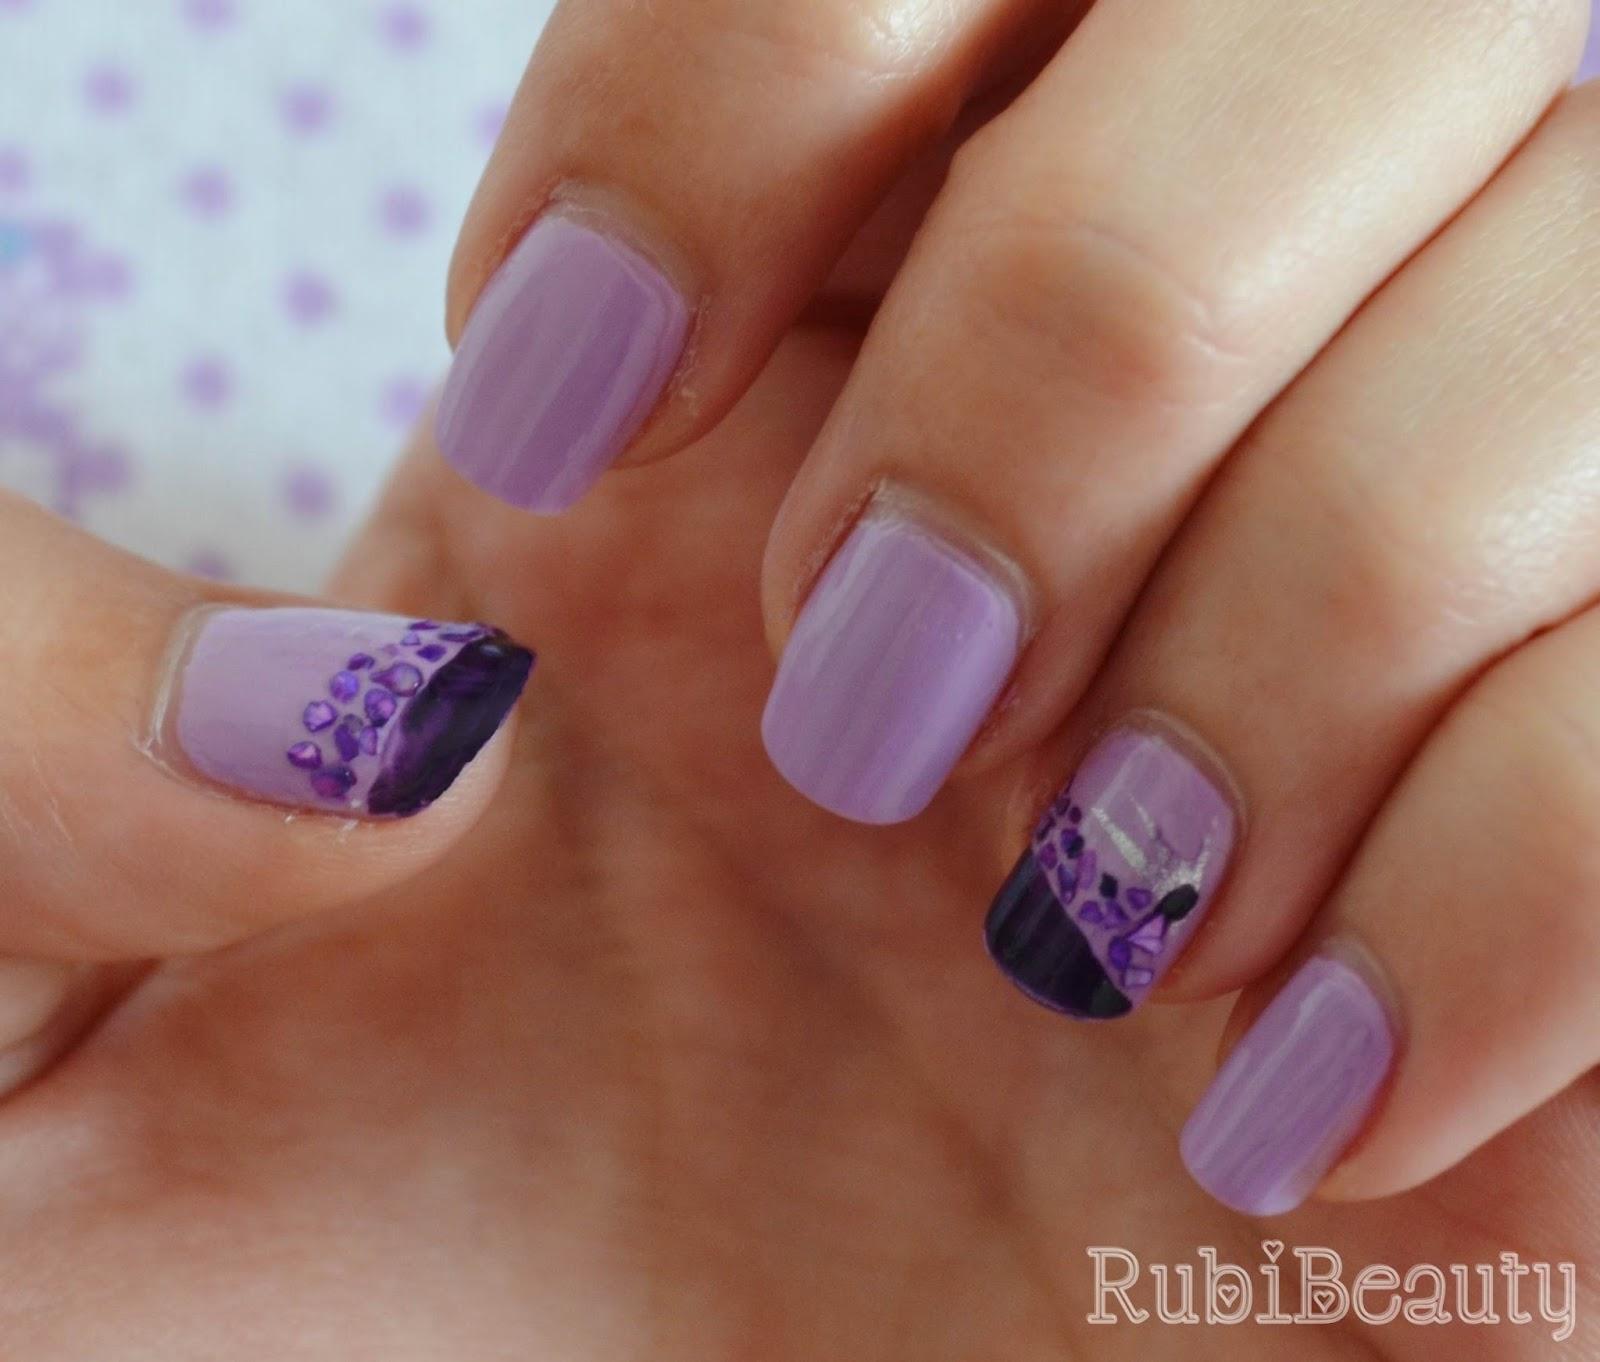 nail art rubibeauty kiko lavanda 330 manicura sencilla